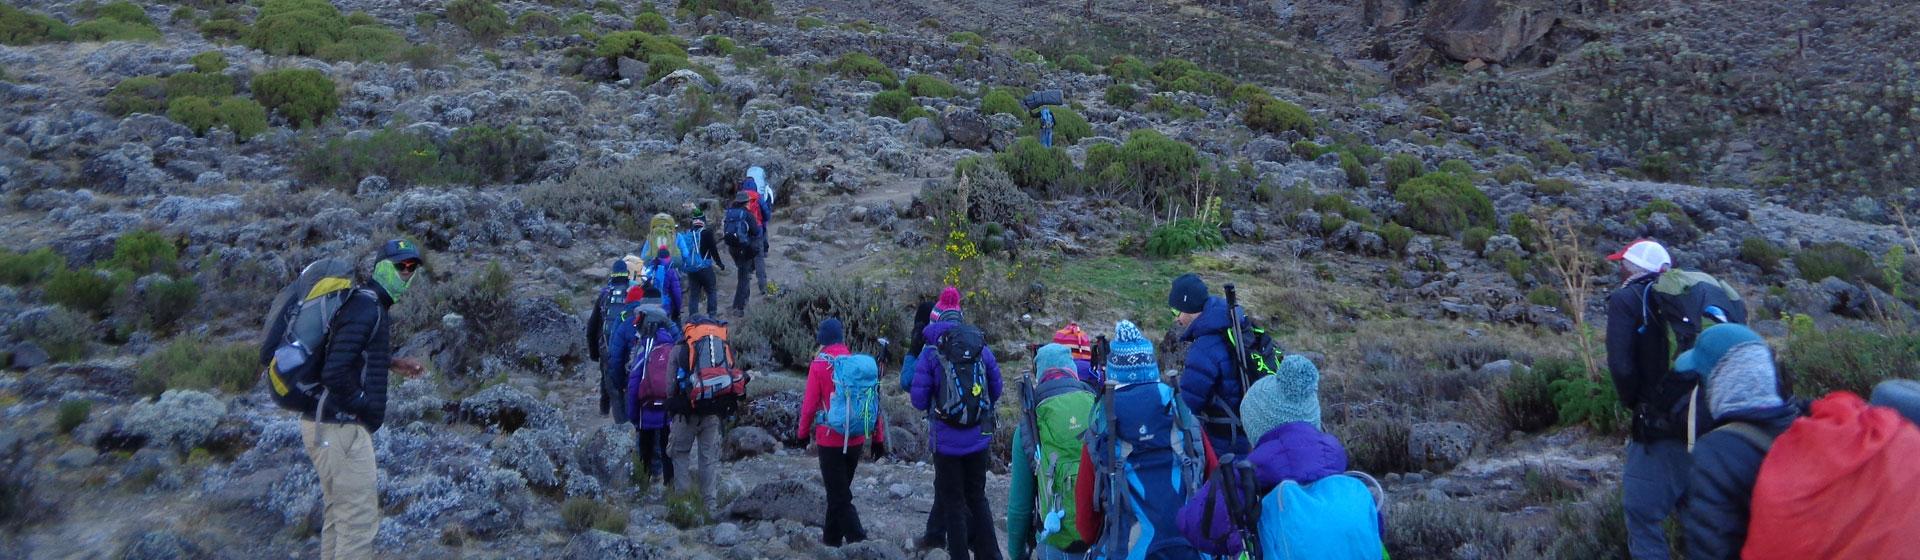 Lemosho Route Climbing Facts